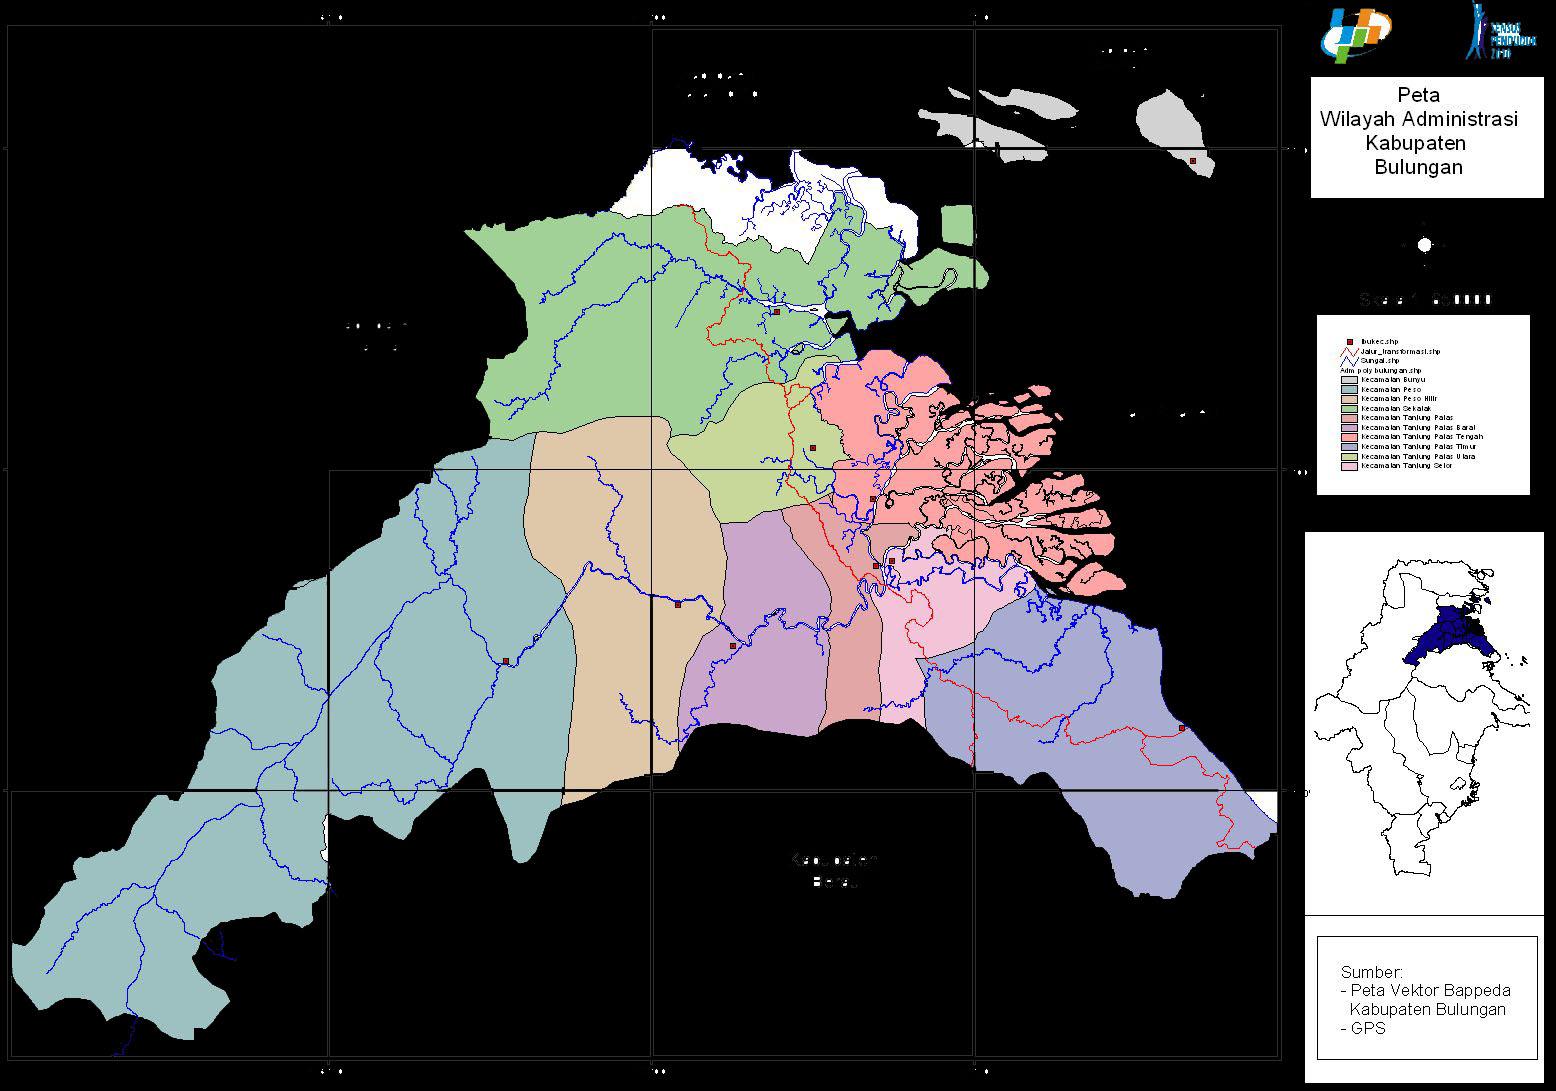 2012 Dinas Kebudayaan Pariwisata Bulungan Kaltara Kabupaten Letak Astronomisnya Berada